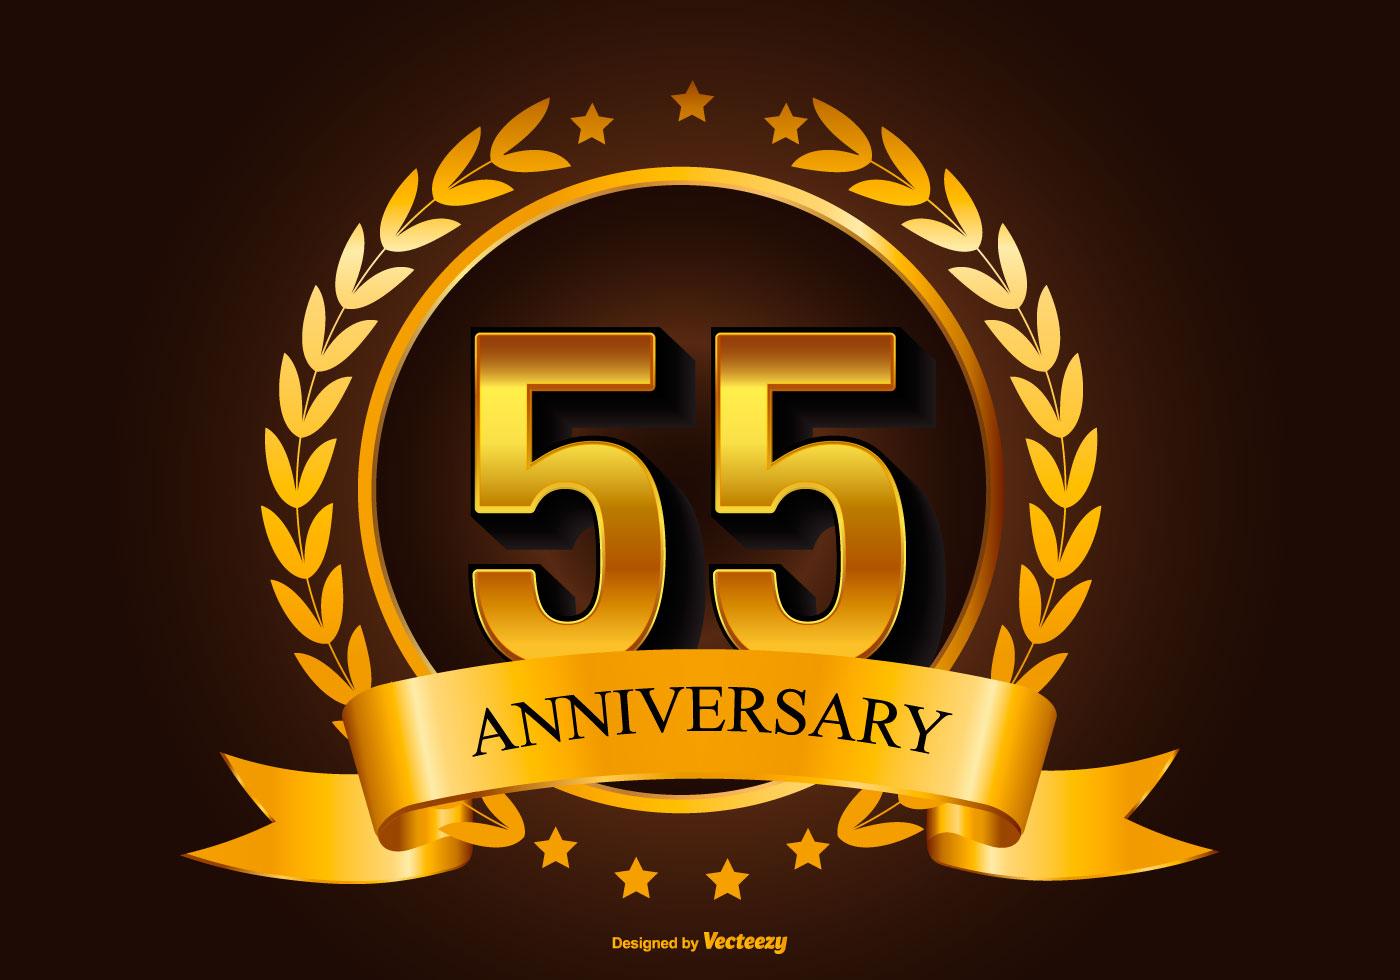 Golden 55th Anniversary Illustration Download Free